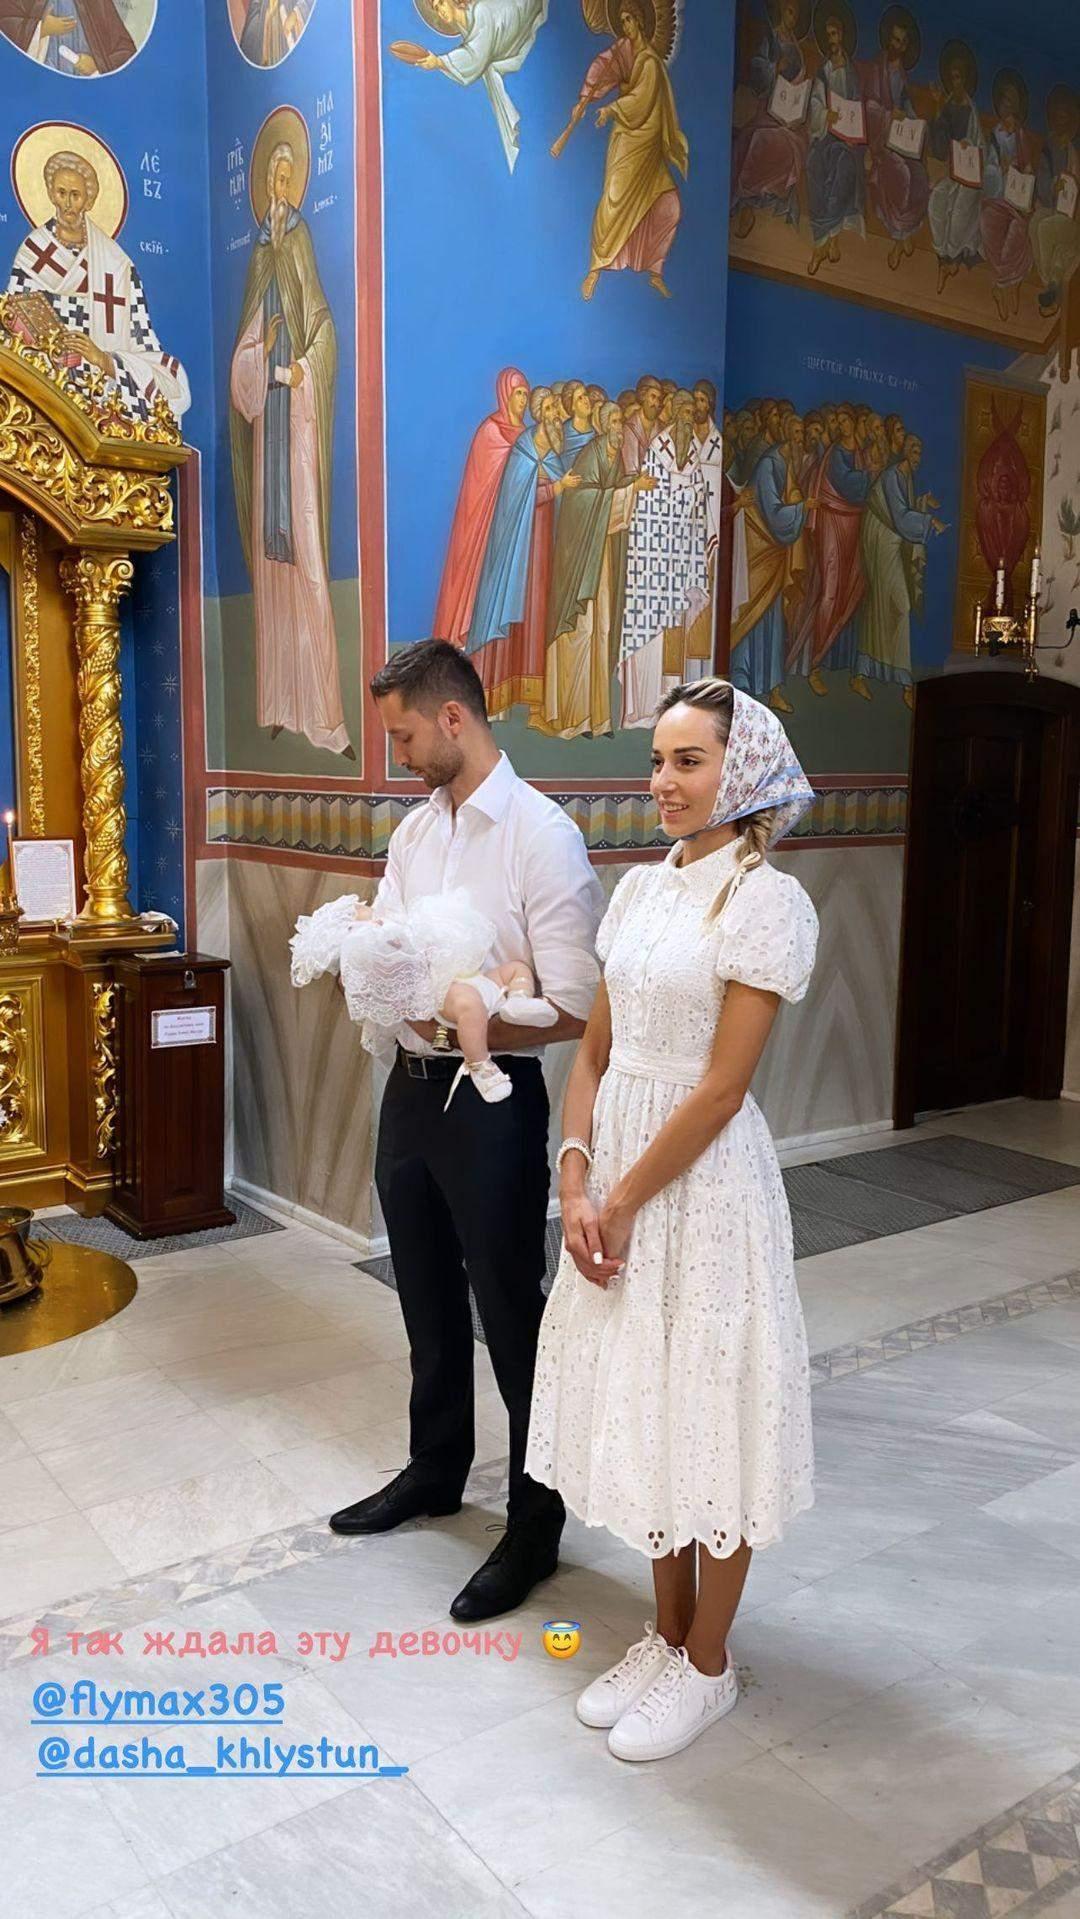 Макс Михайлюк і Даша Хлистун охрестили доньку